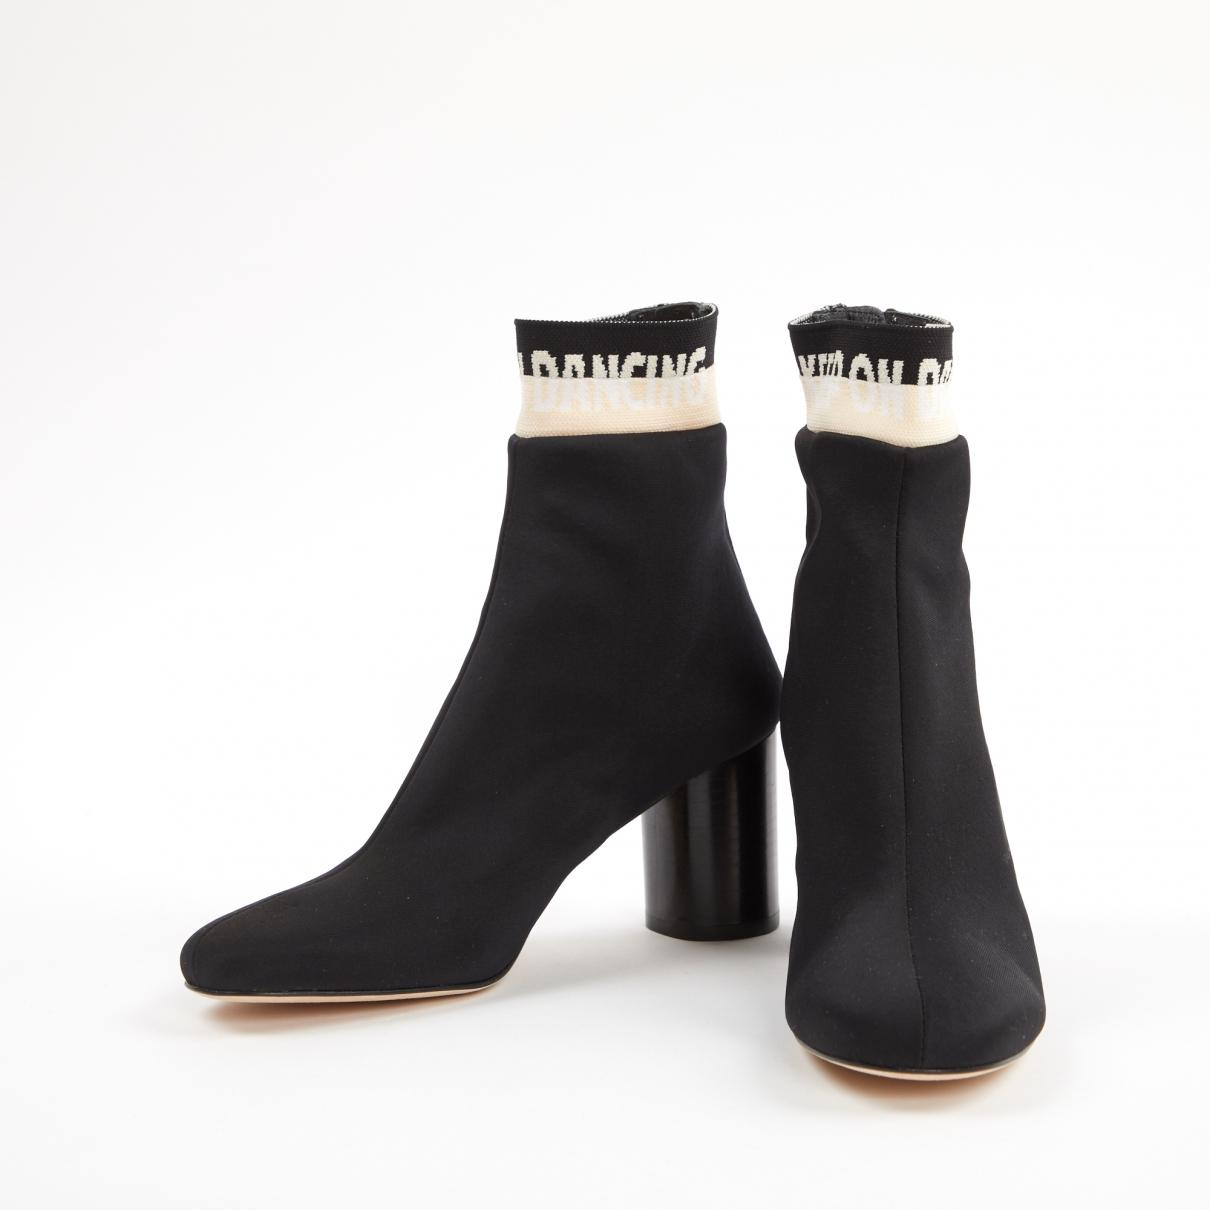 Botines de Lona Sandro de color Negro